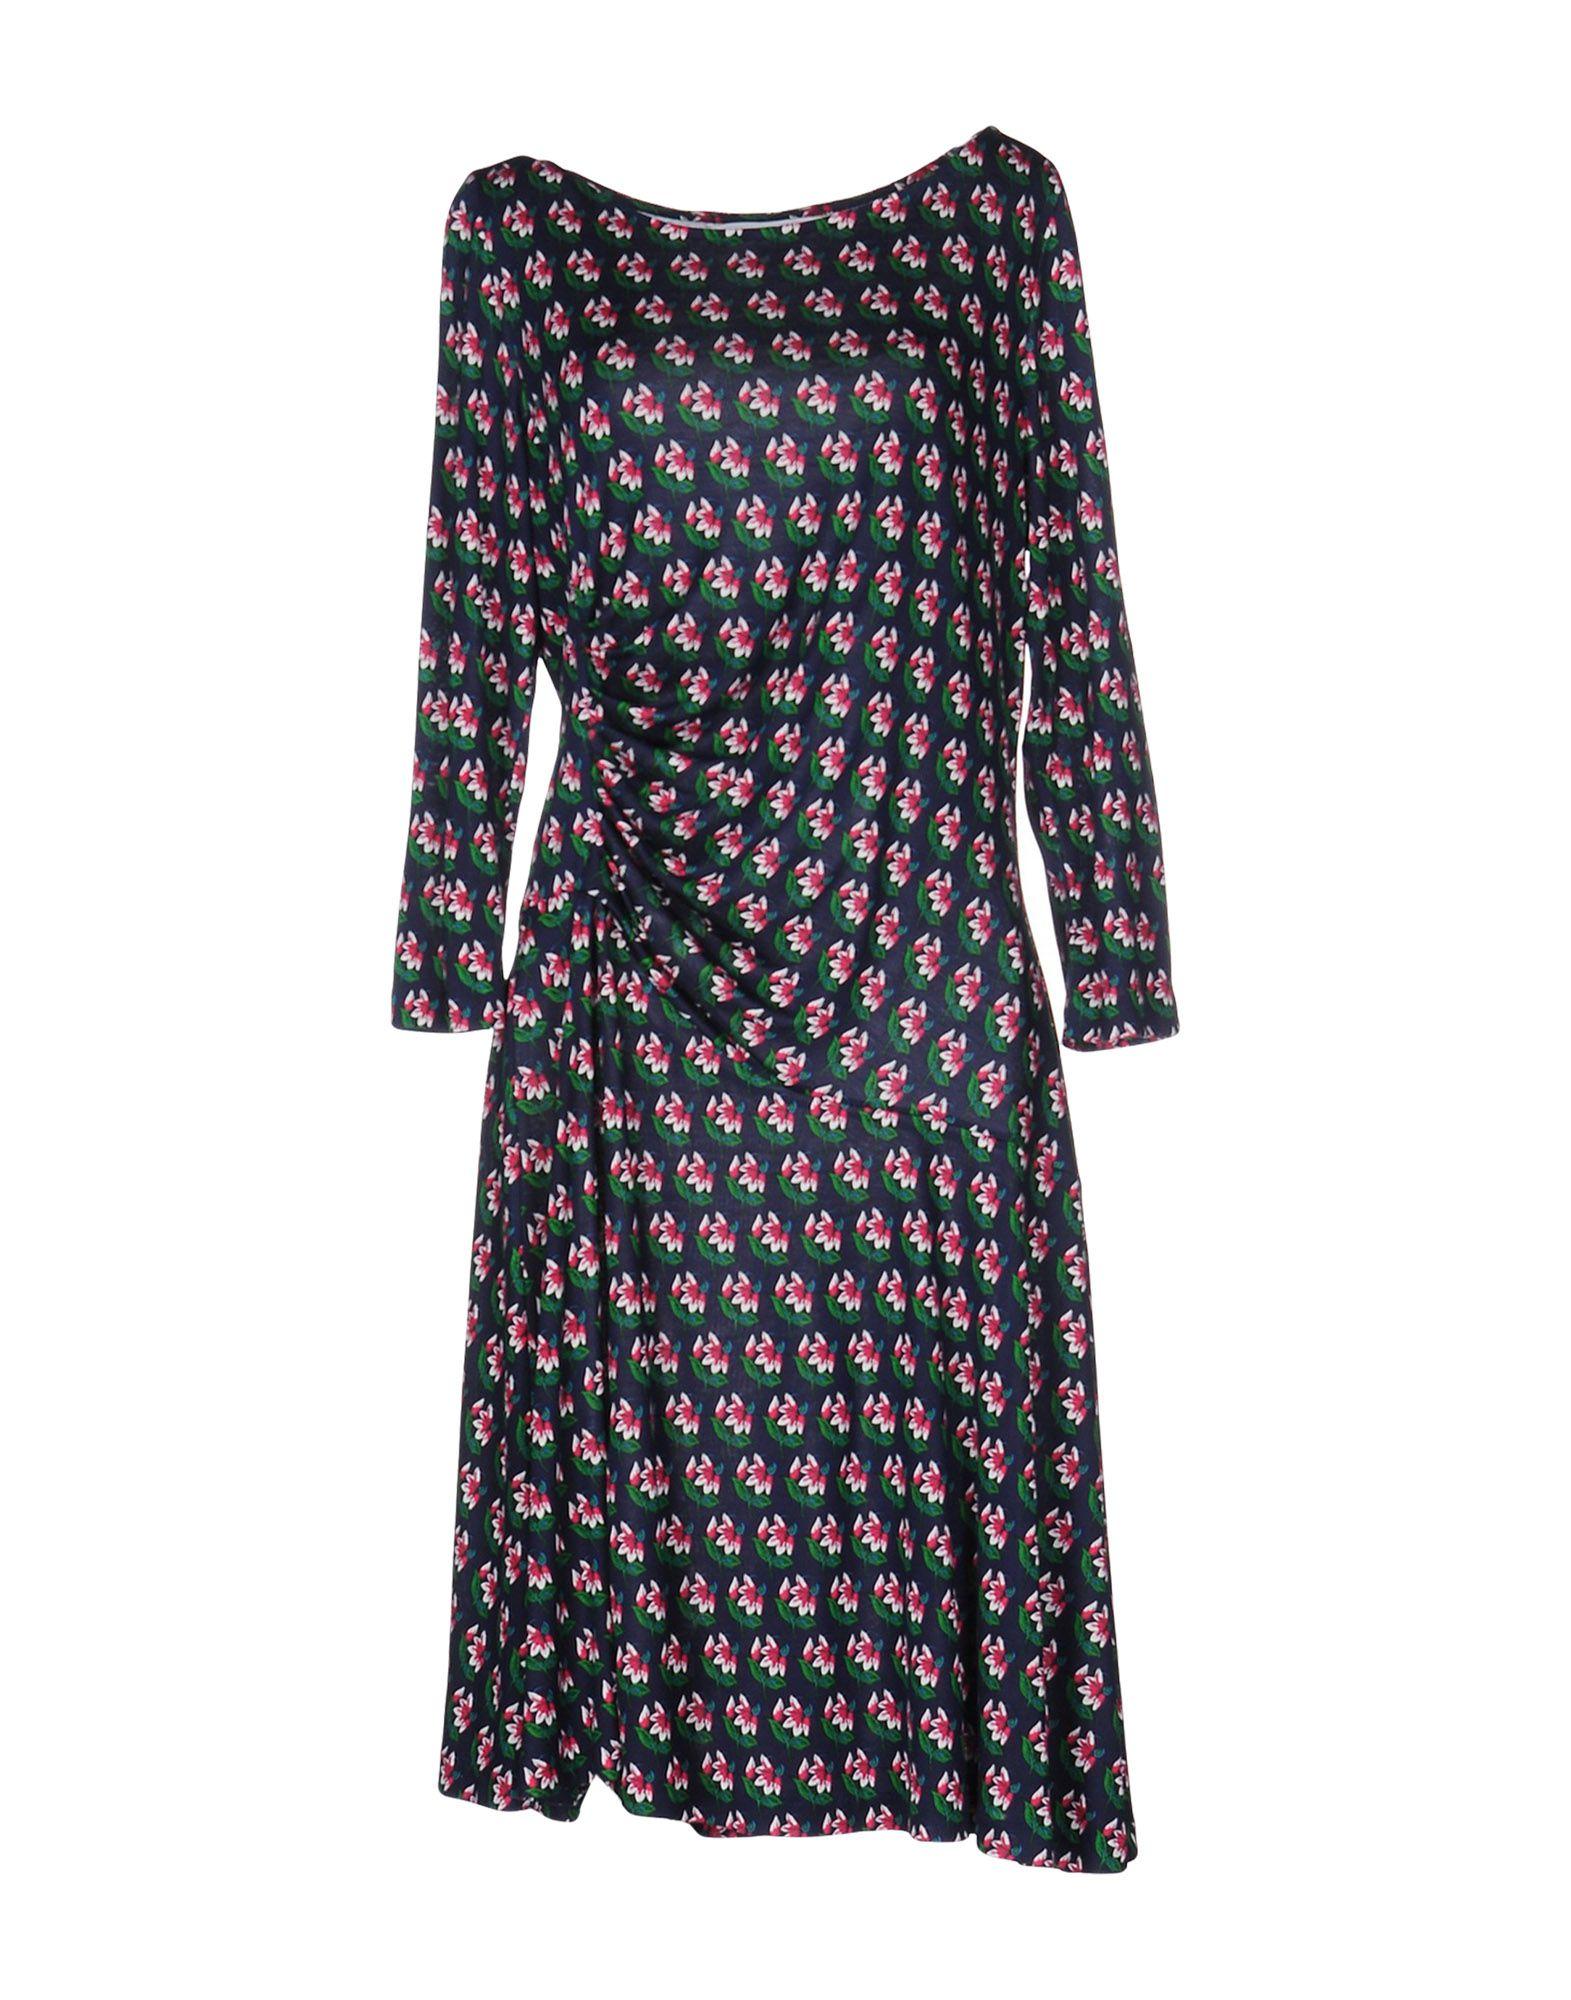 Фото платье от diane von